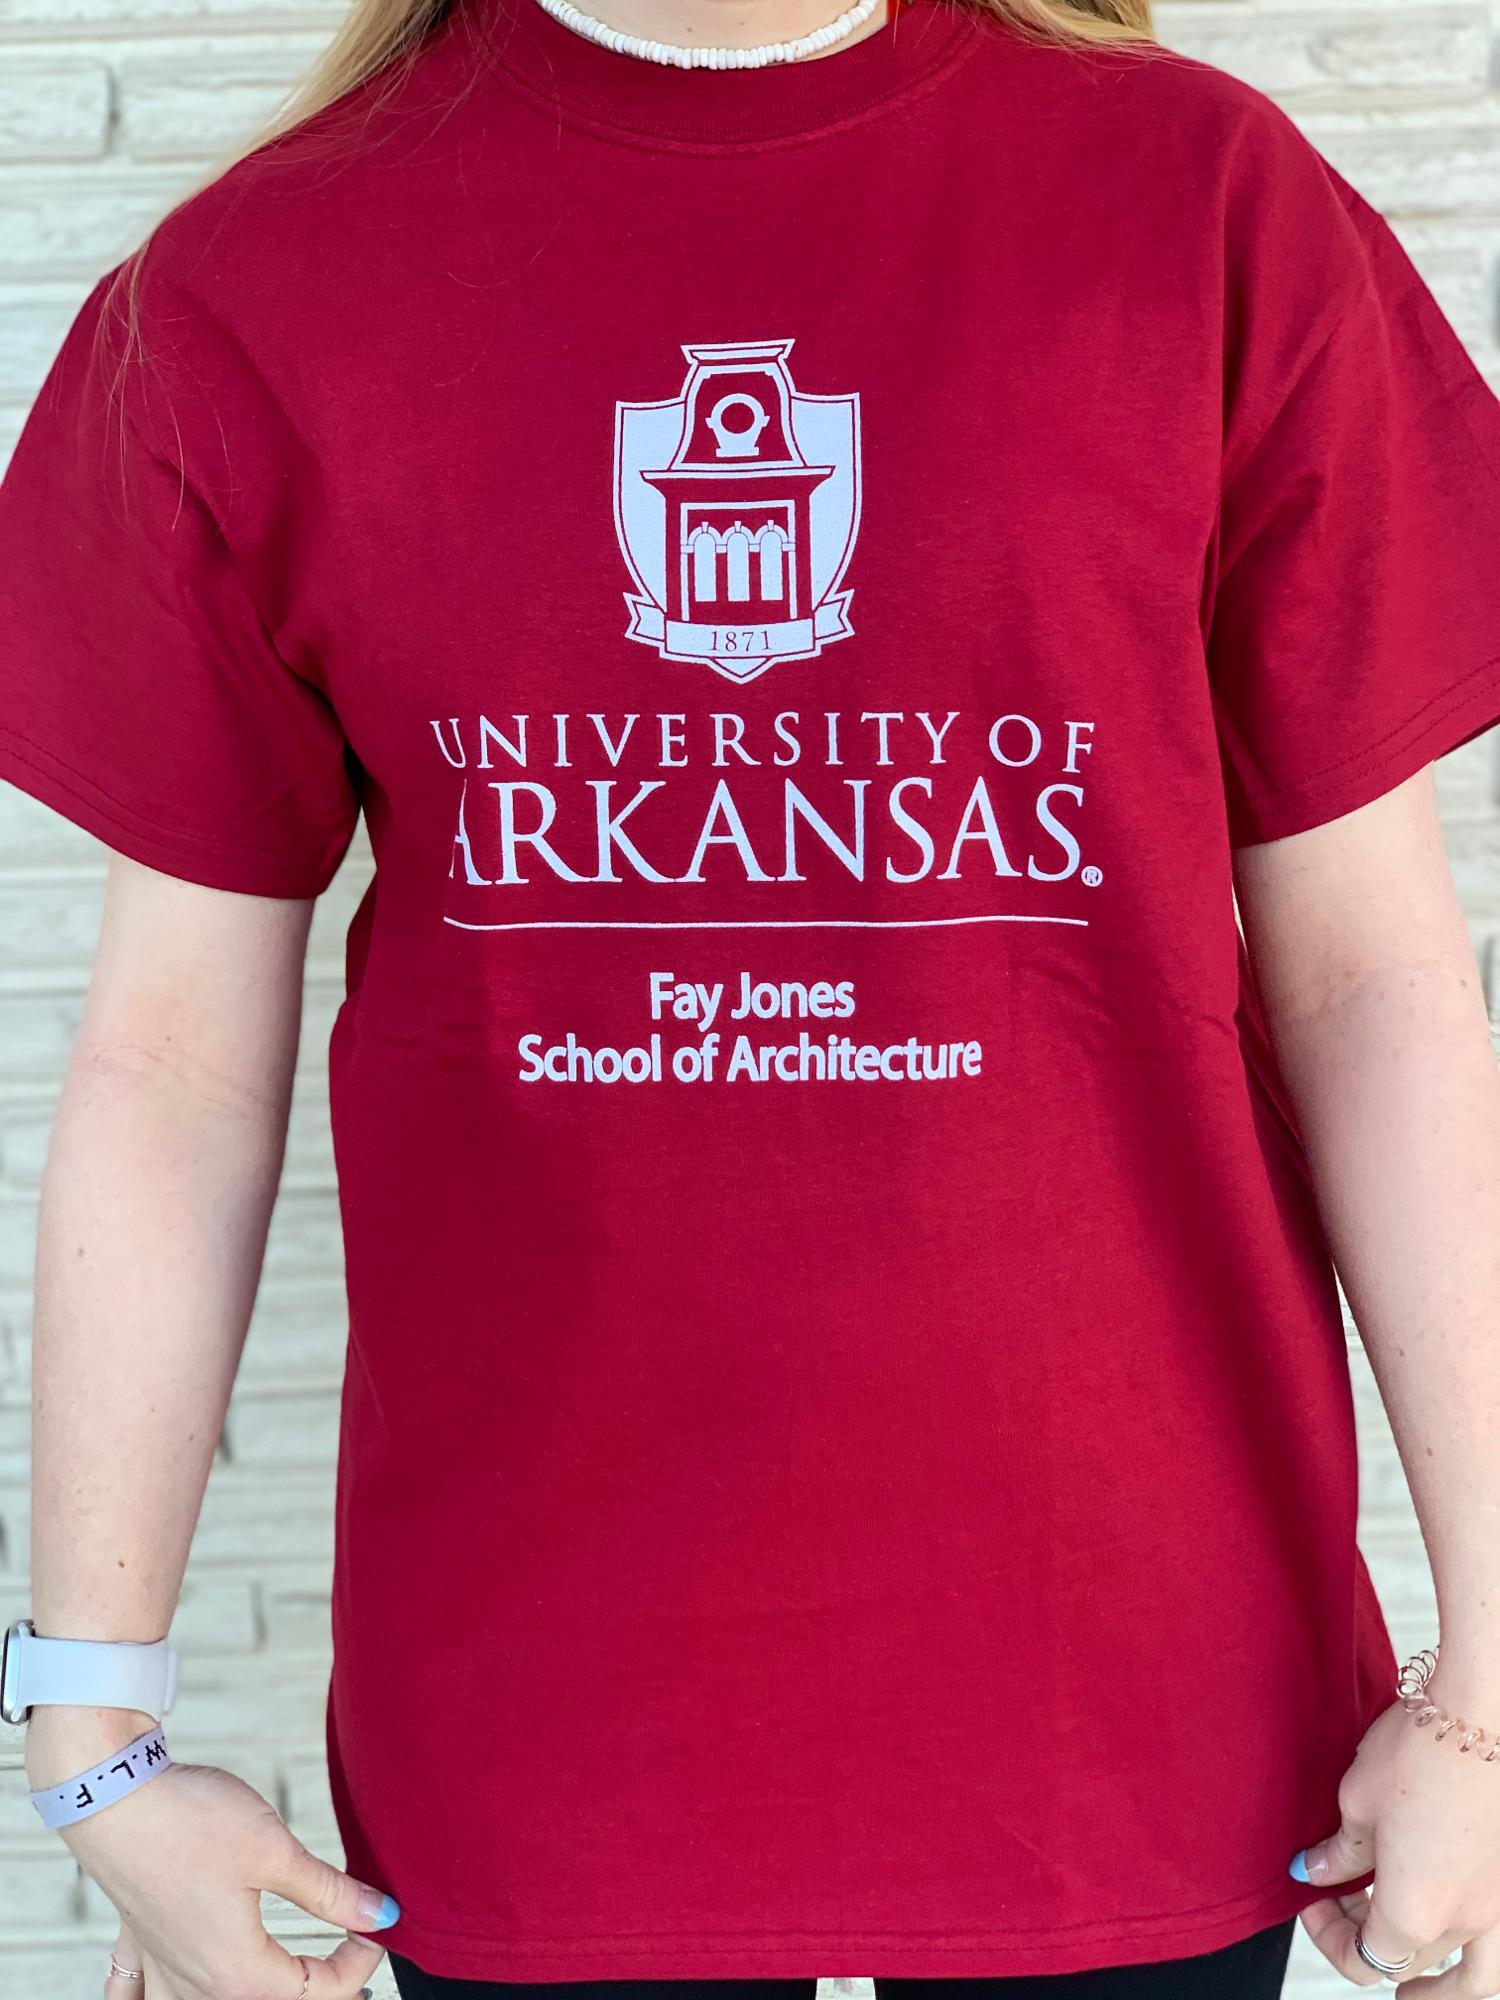 image of: University of Arkansas Fay Jones School of Architecture Tee - Crimson